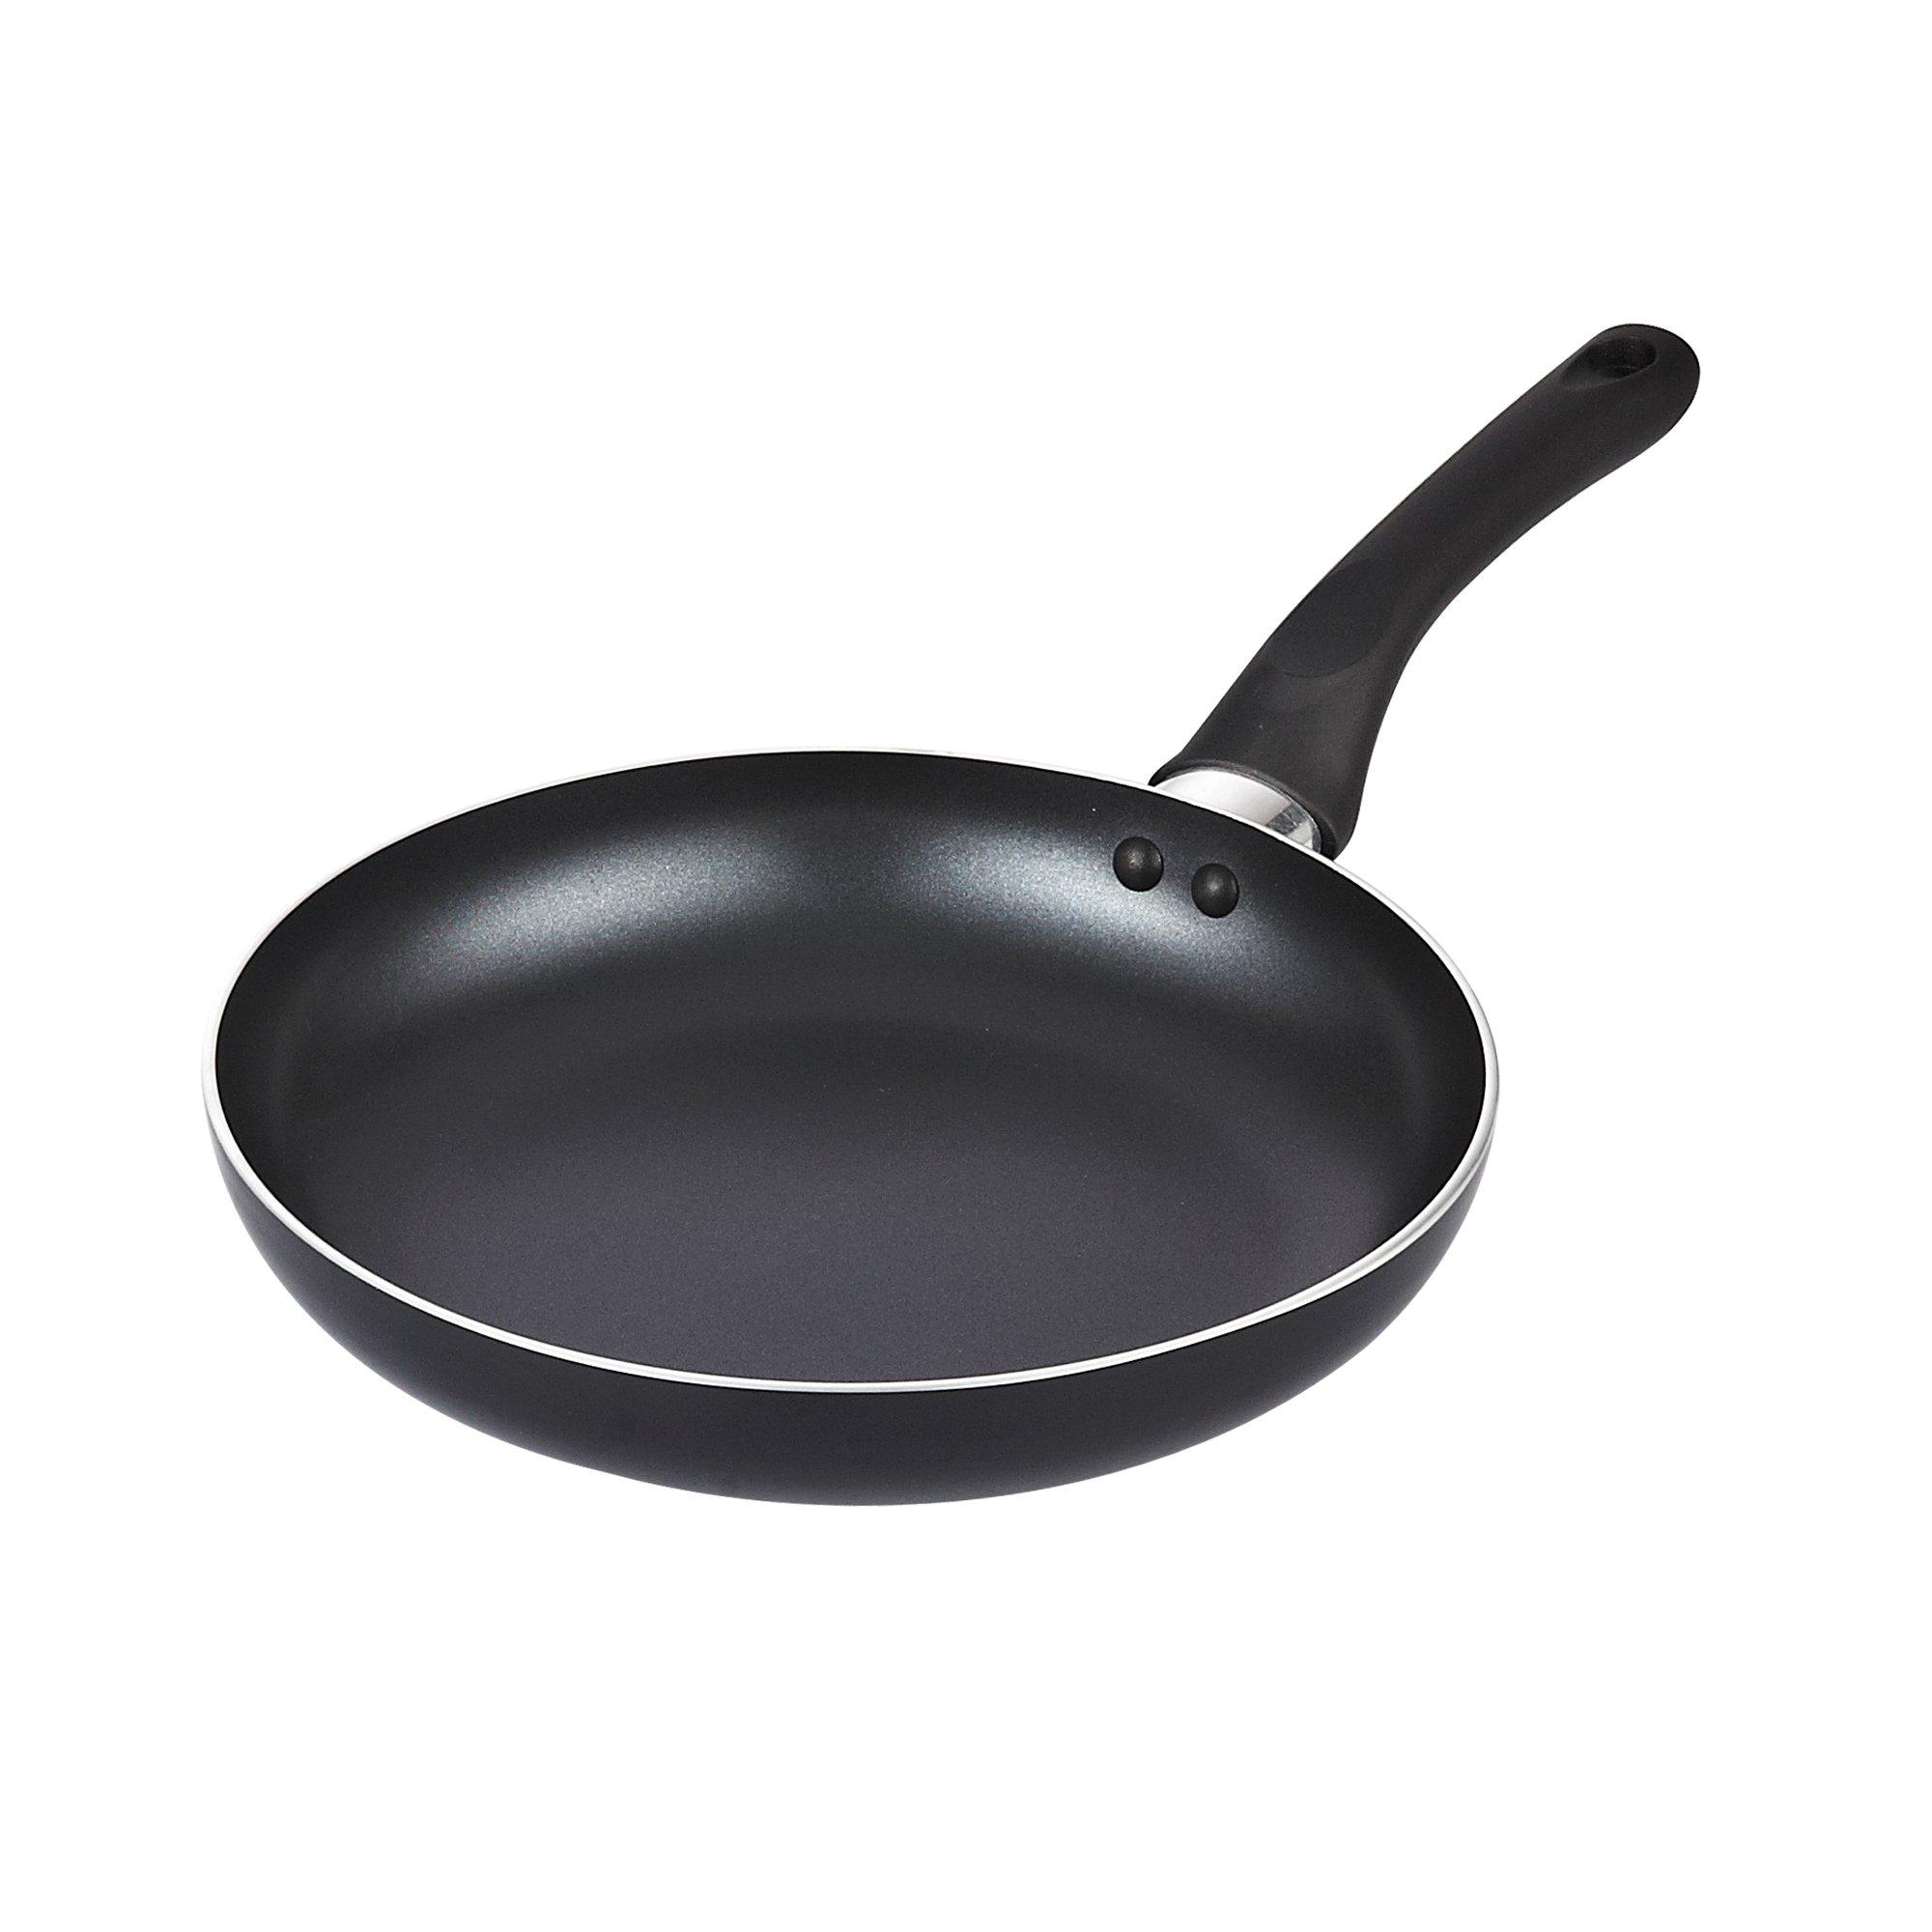 Cook N Home 11-Inch Nonstick Saute Fry Pan, 28cm, Black